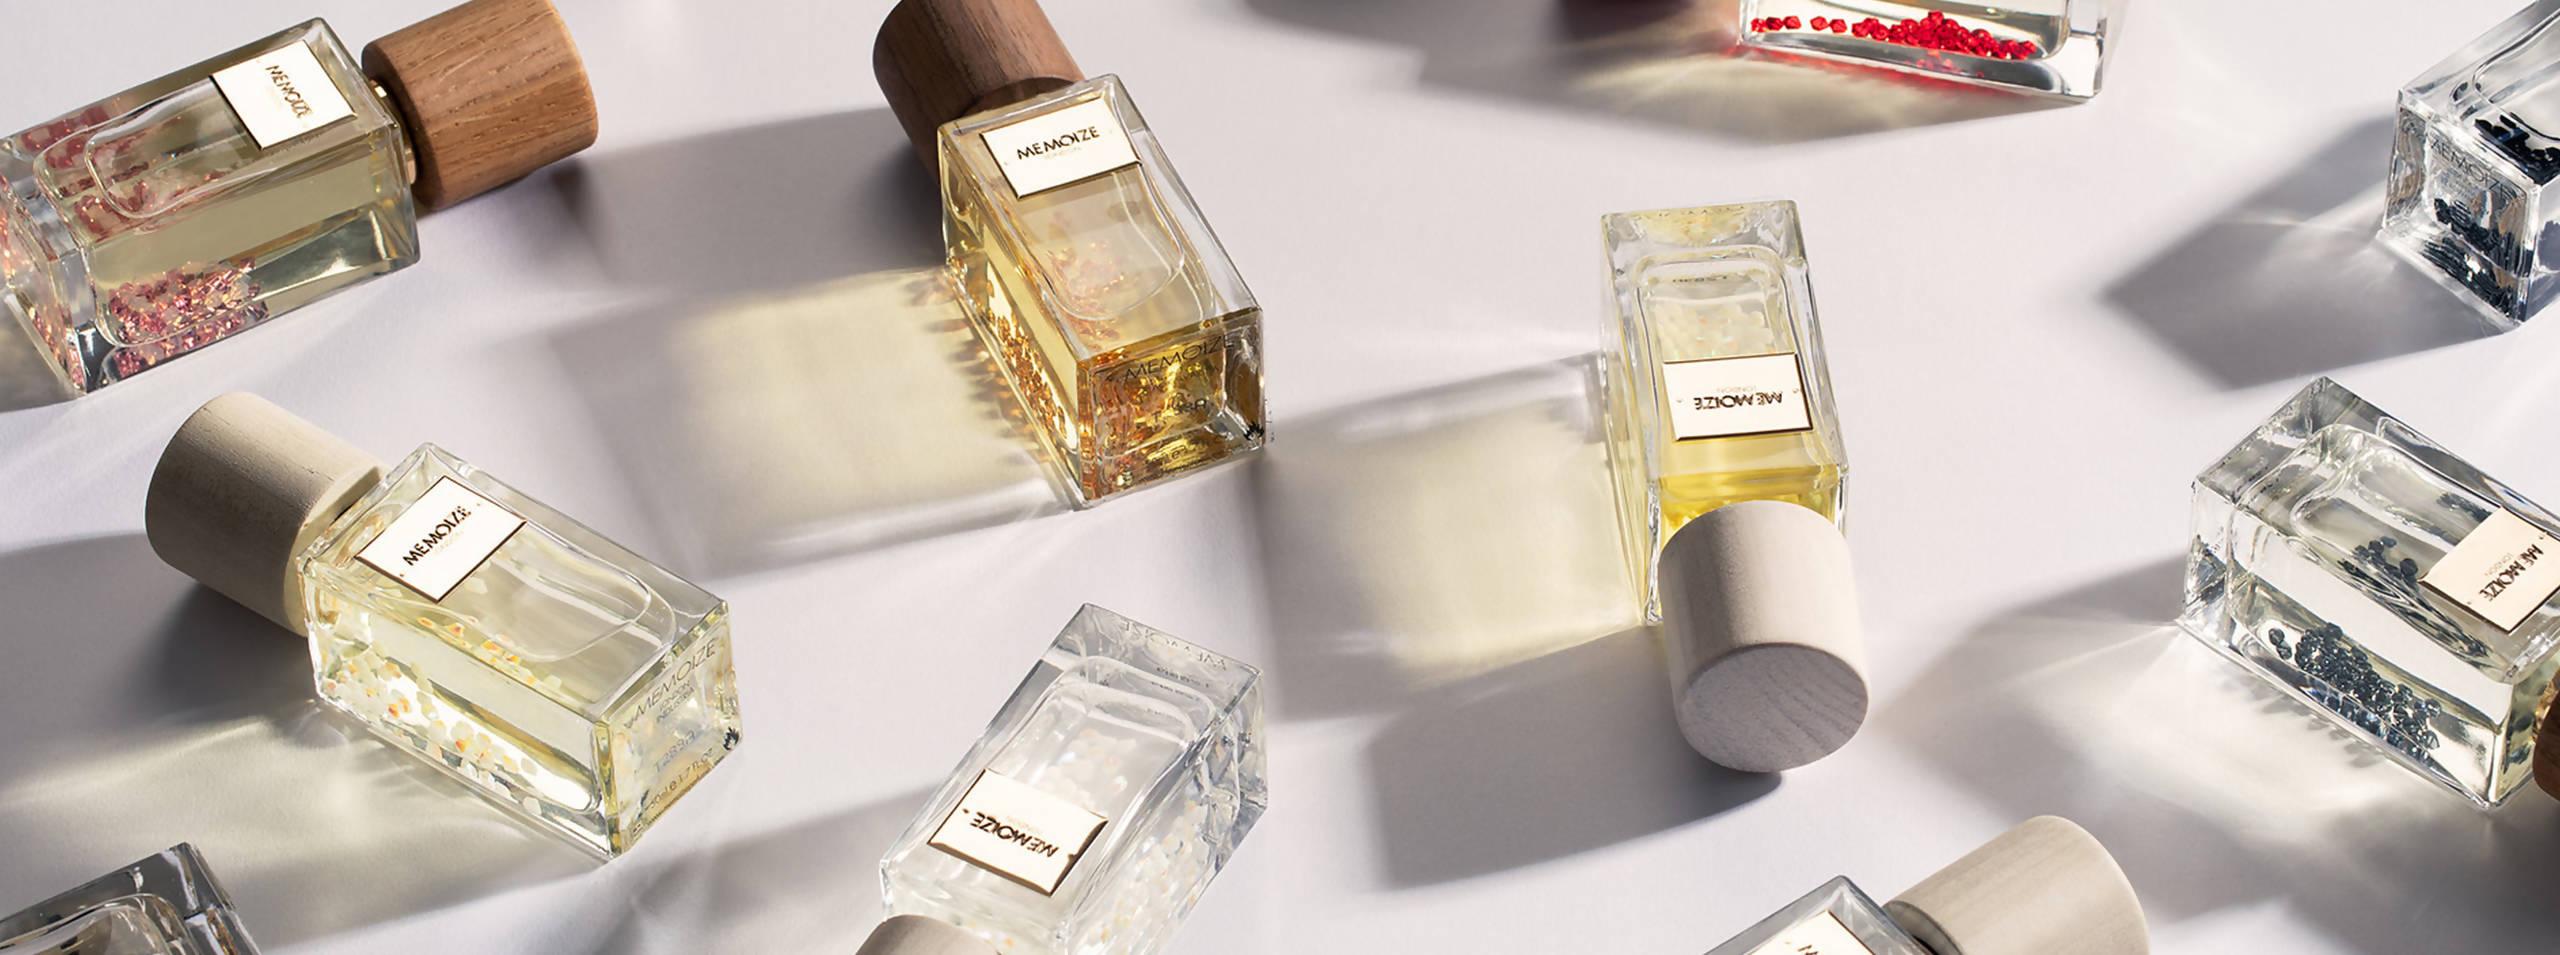 Memoize Parfum